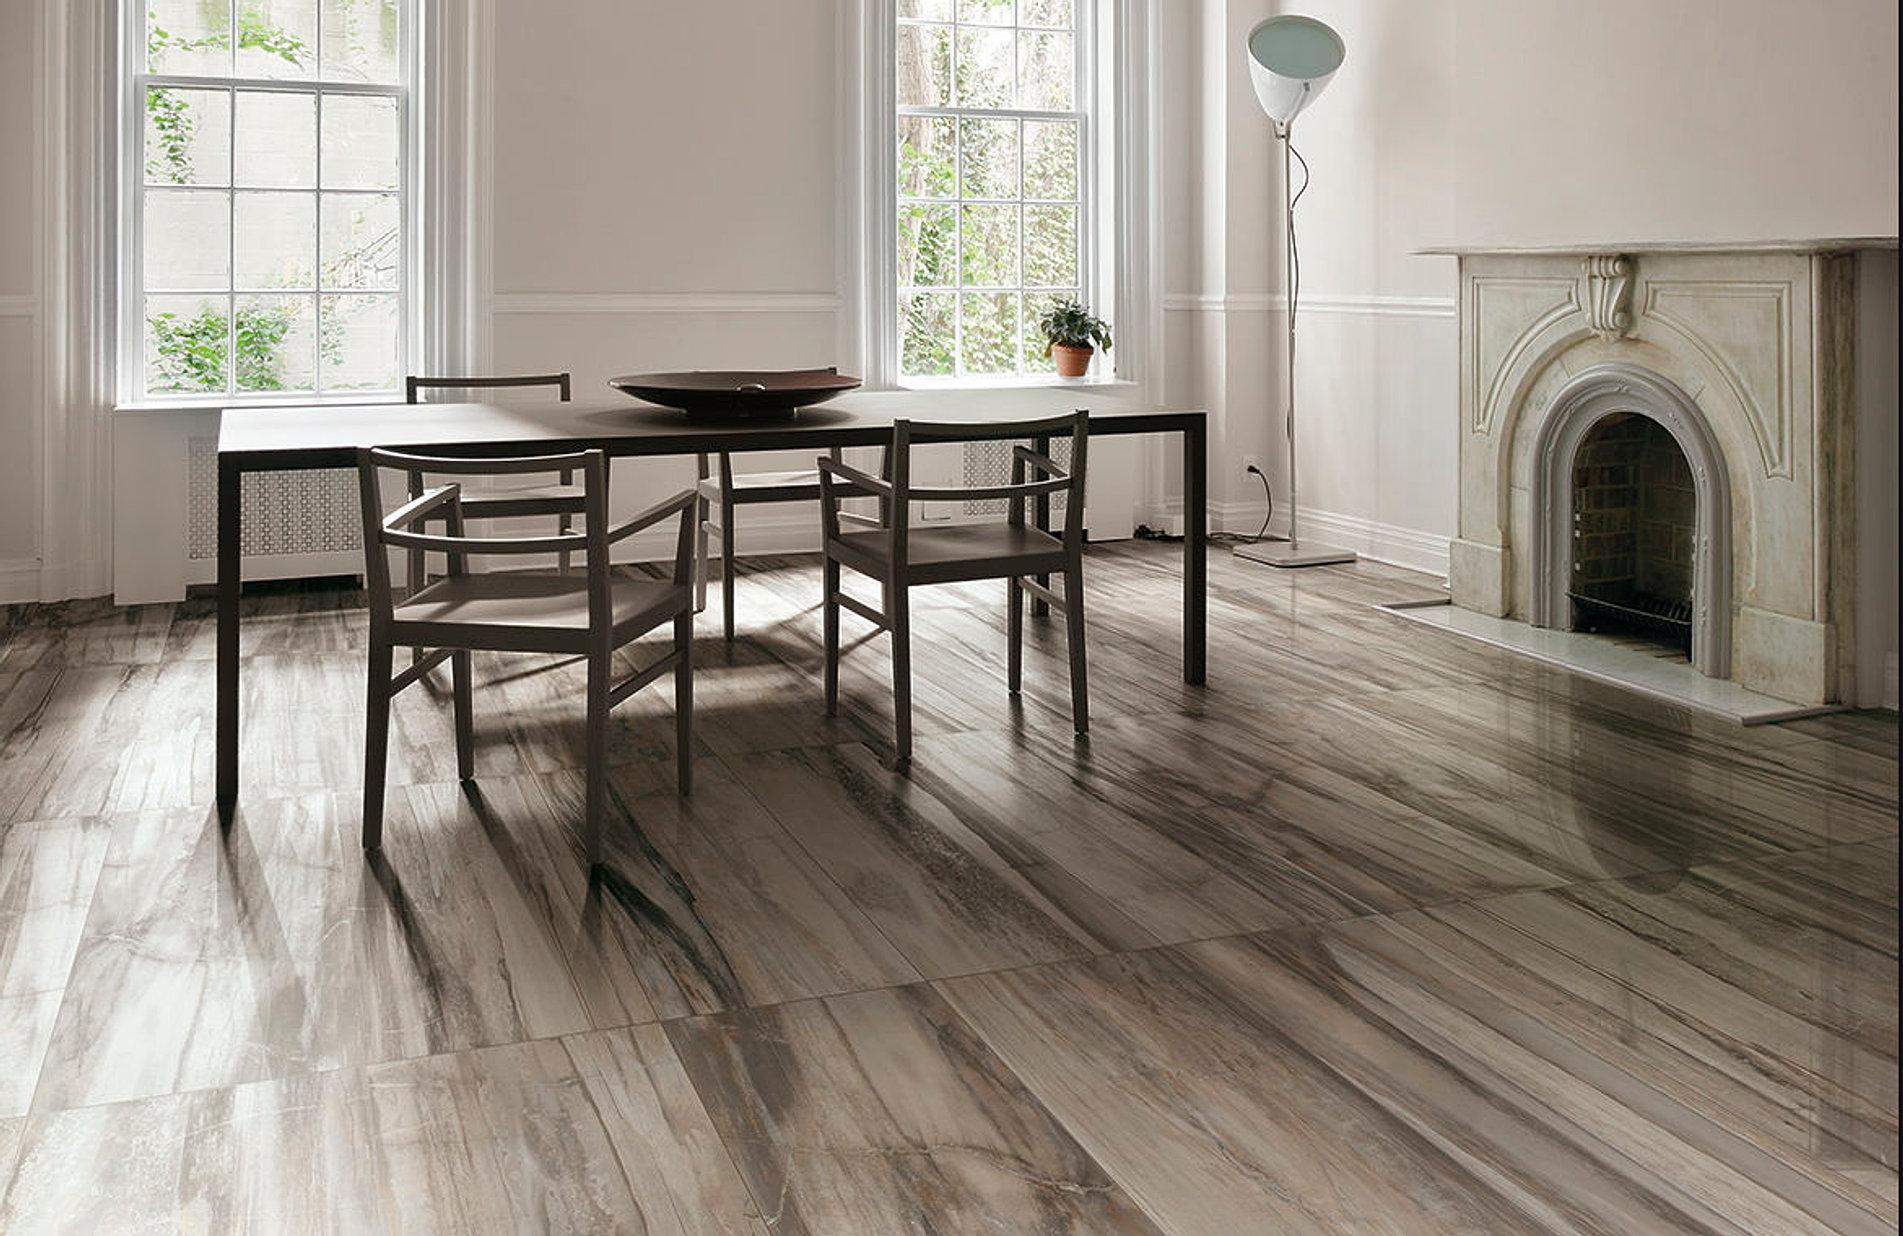 Dark brown ceramic floor tile images home flooring design calvetta brothers floor show 216 662 5550 grey wood floor tile ceramic floor tile stone marialoaizafo dailygadgetfo Images